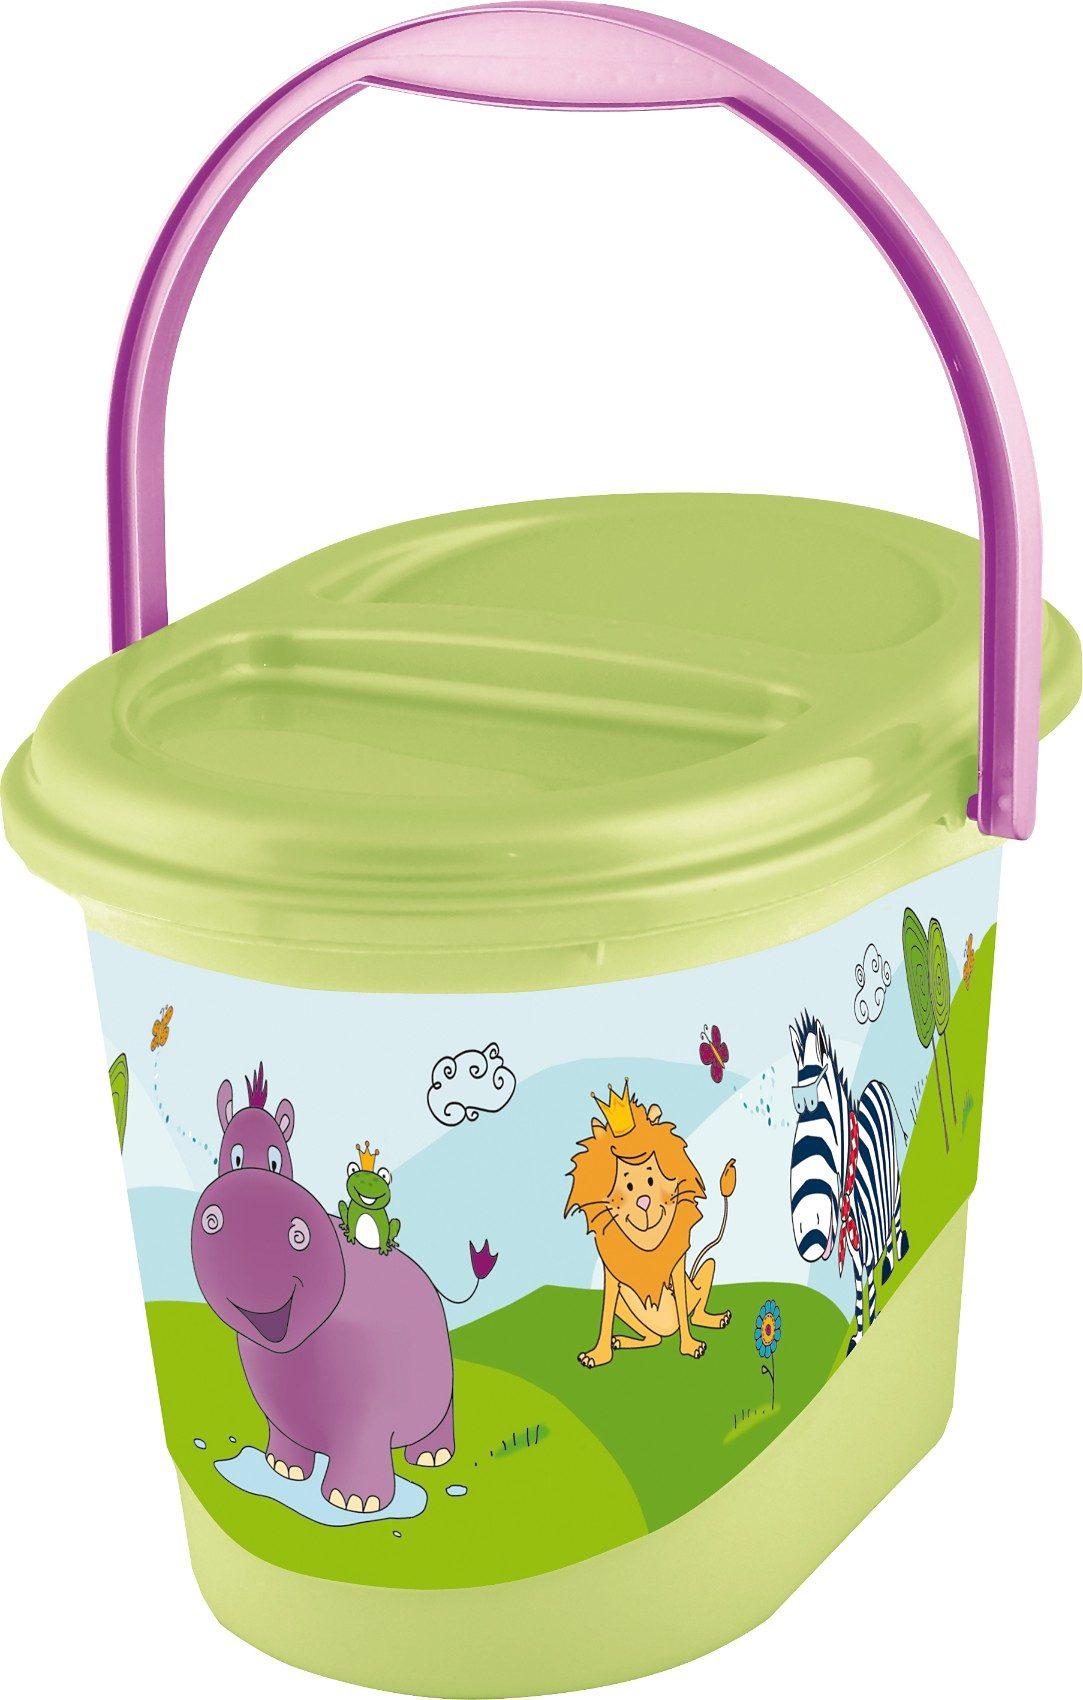 OKT kids Windeleimer Hippo, limegrün